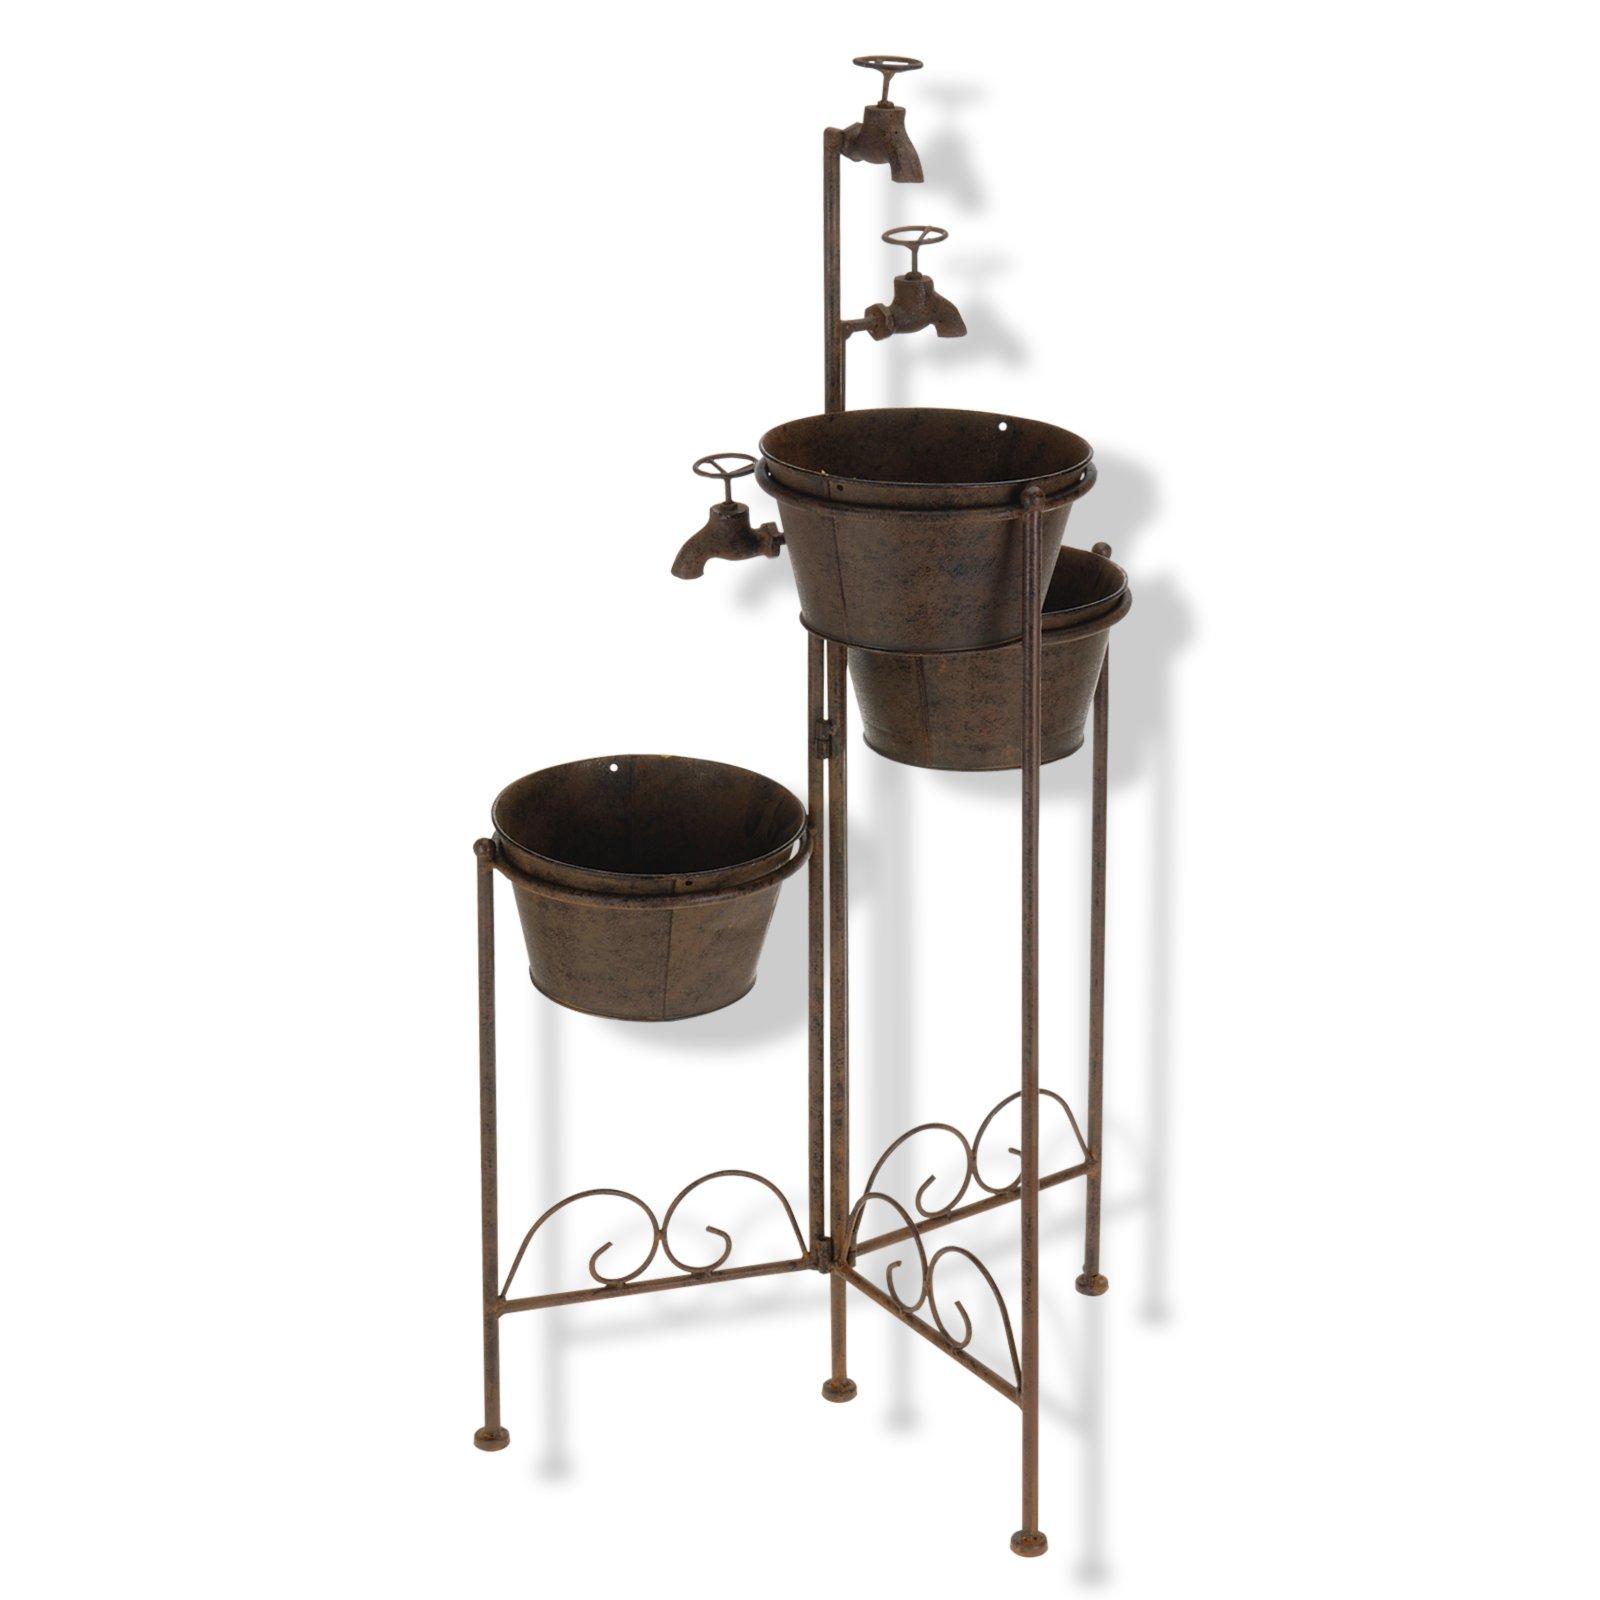 pflanzt pfe mit wasserhahn braun rost 3 t pfe. Black Bedroom Furniture Sets. Home Design Ideas